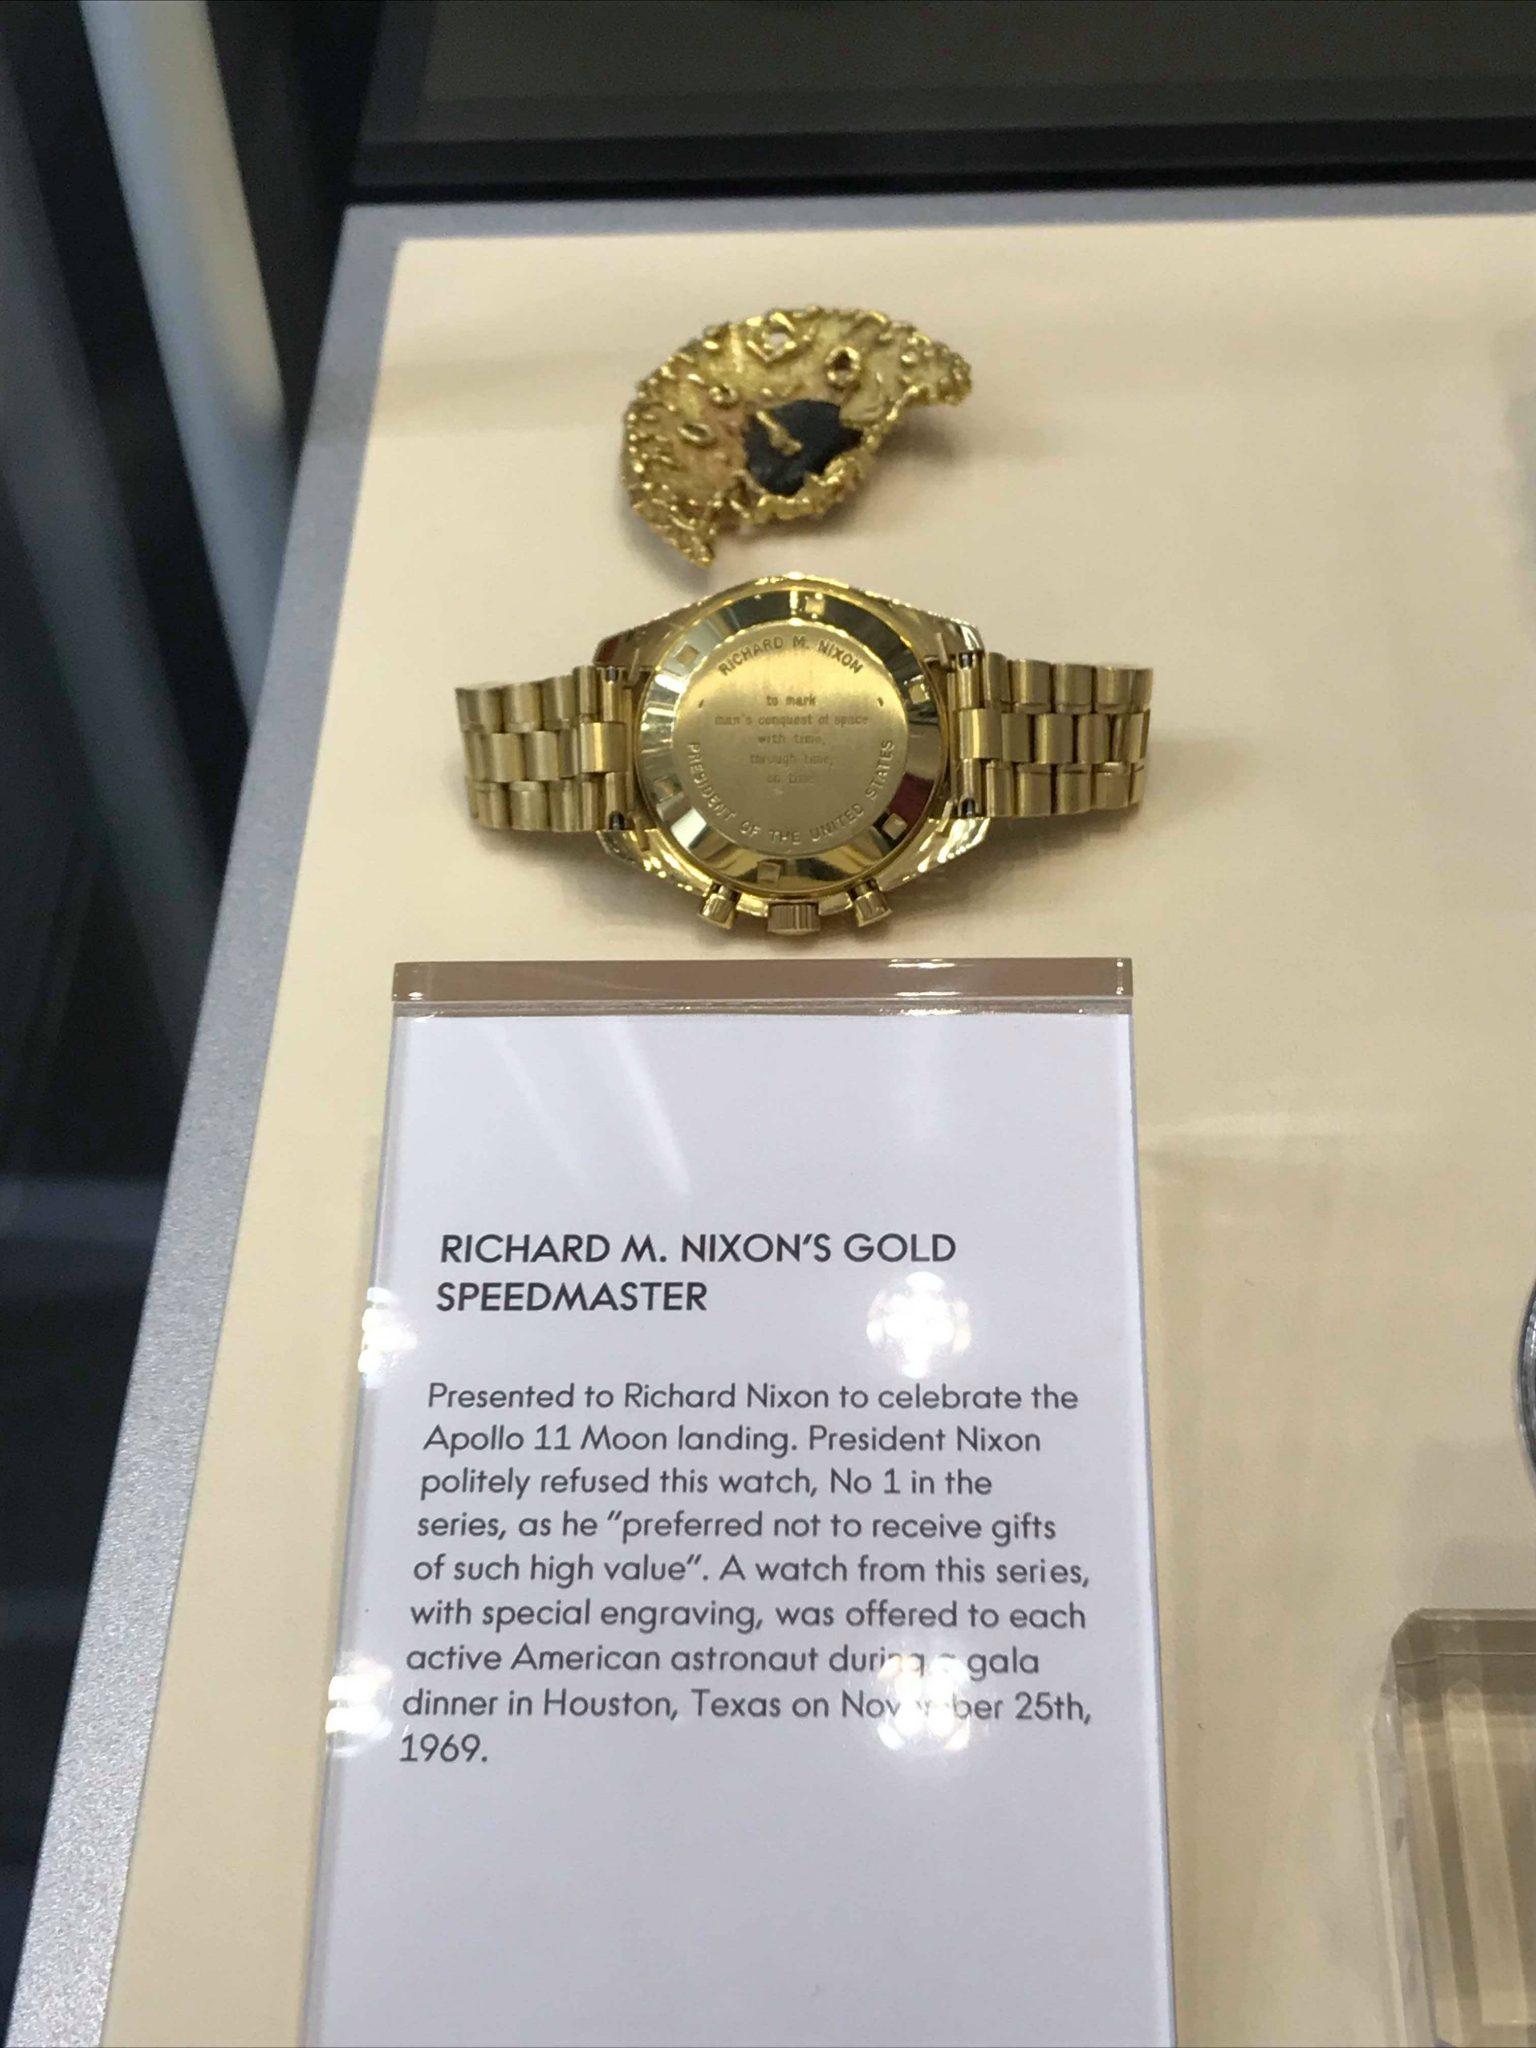 Richard Nixon Speedmaster, Moonwatch, Omega Museum, Biel, Switzerland